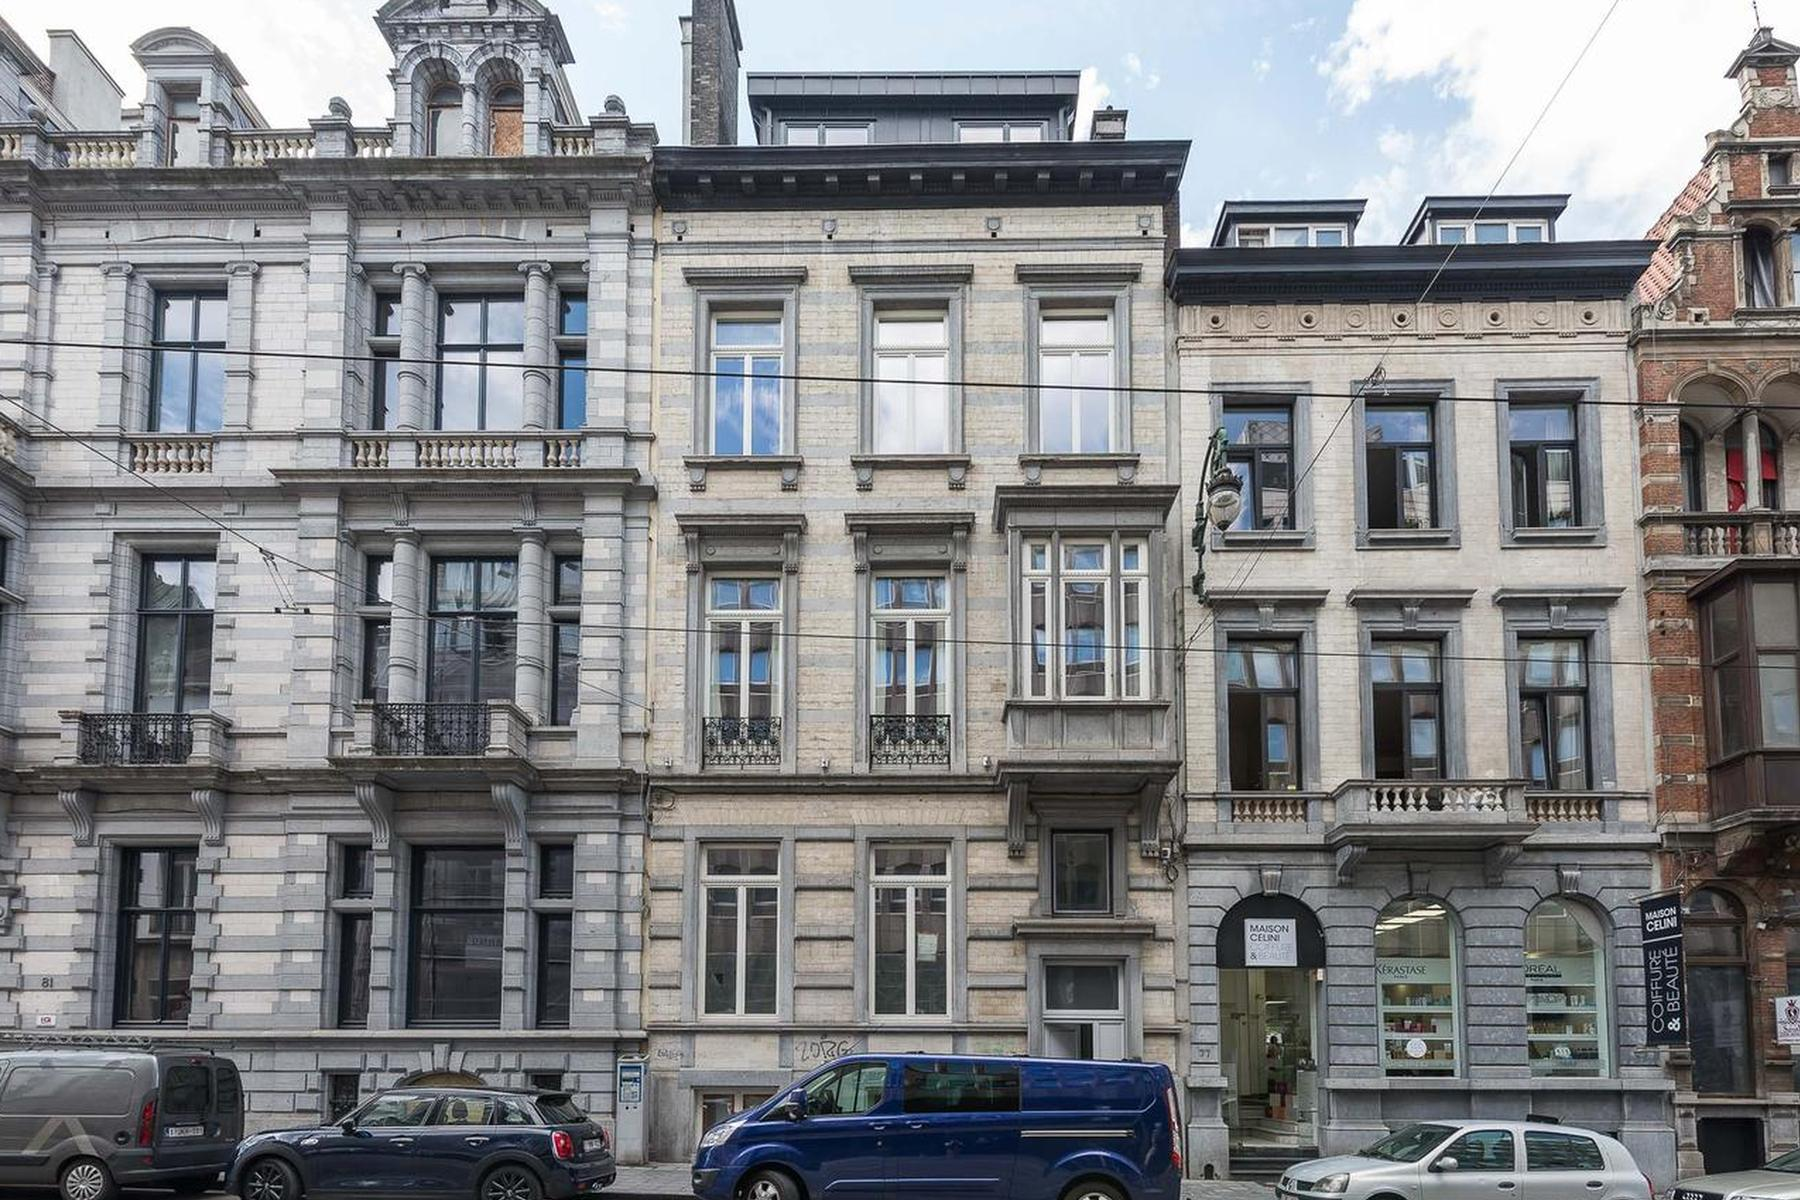 Apartment for Rent at Bruxelles I Place Stéphanie 79 Chaussée de Charleroi Brussels, Brussels 1060 Belgium